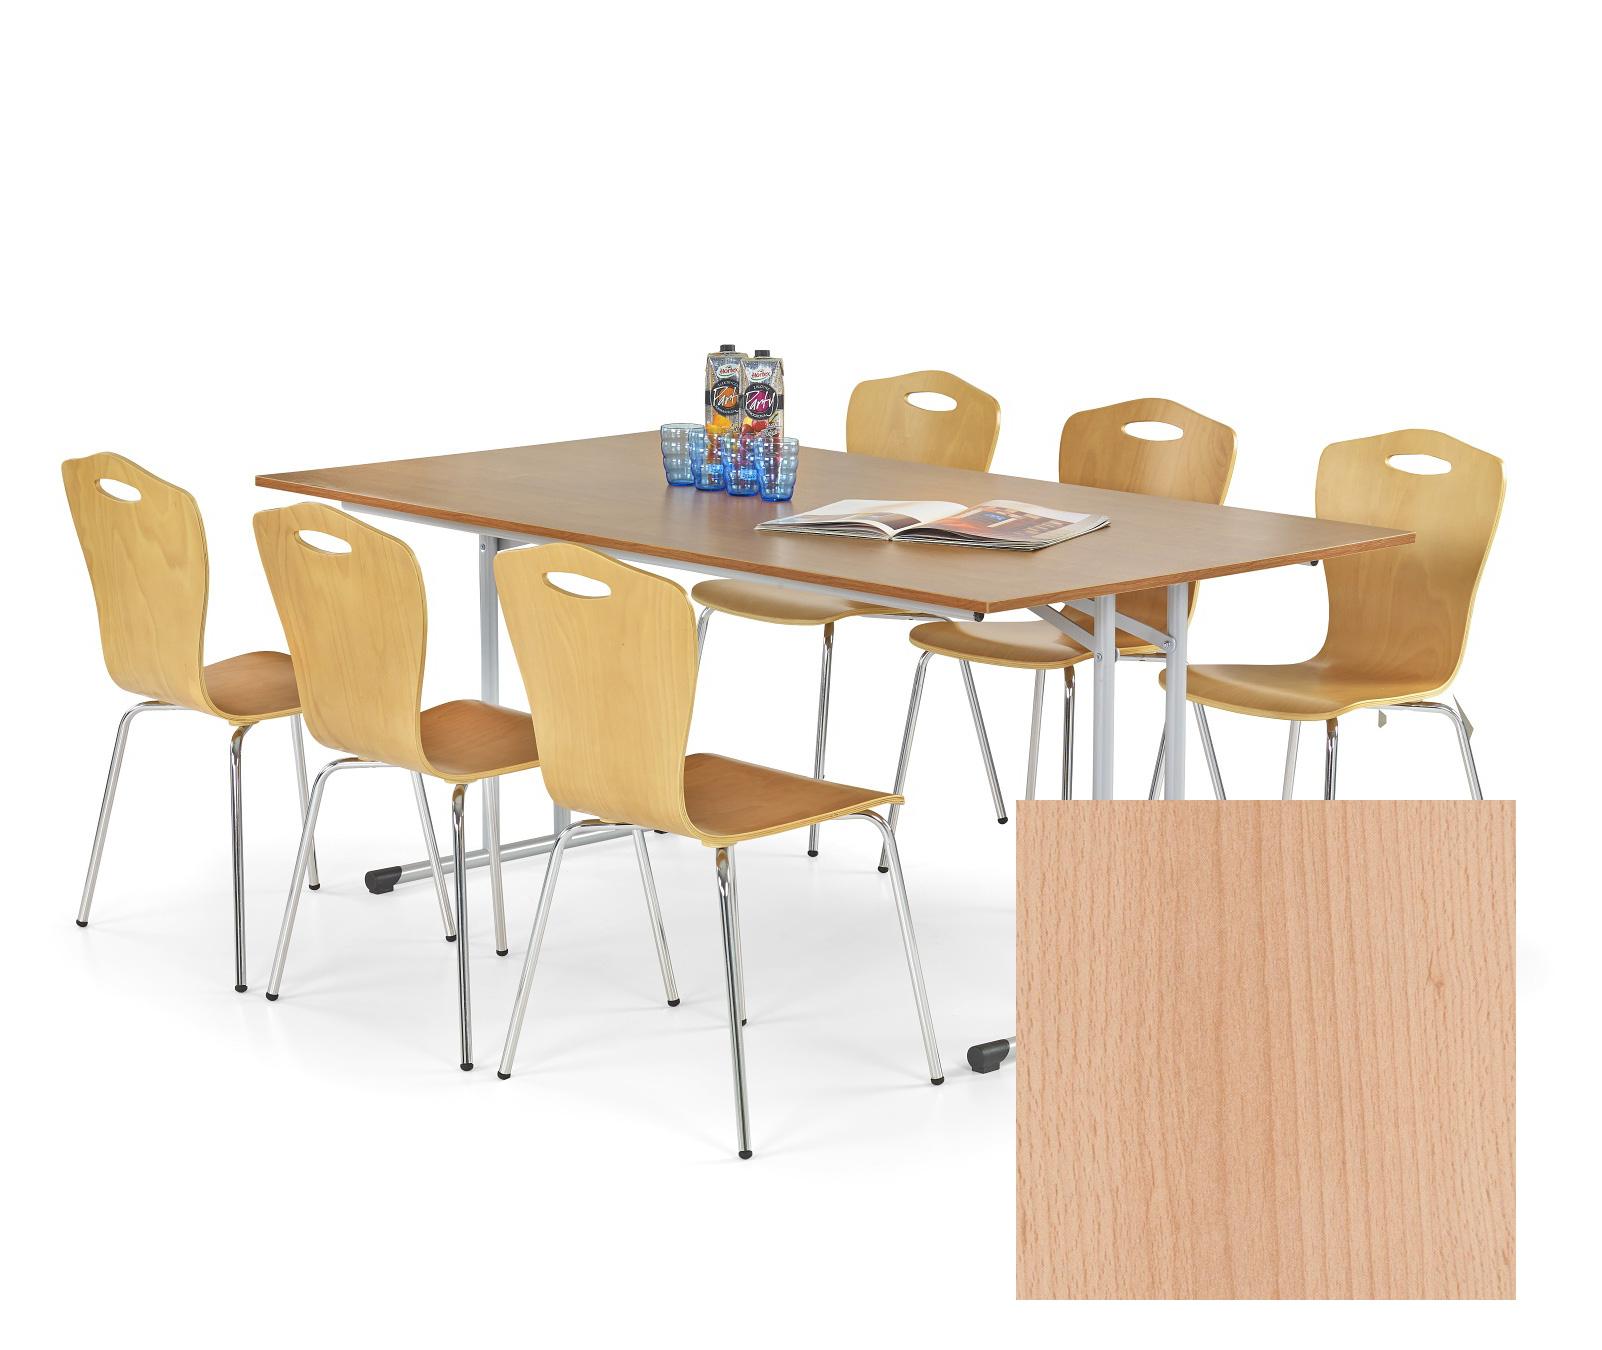 Konferens bord fällbart 180 cm bord Bok 1995 kr Trendru